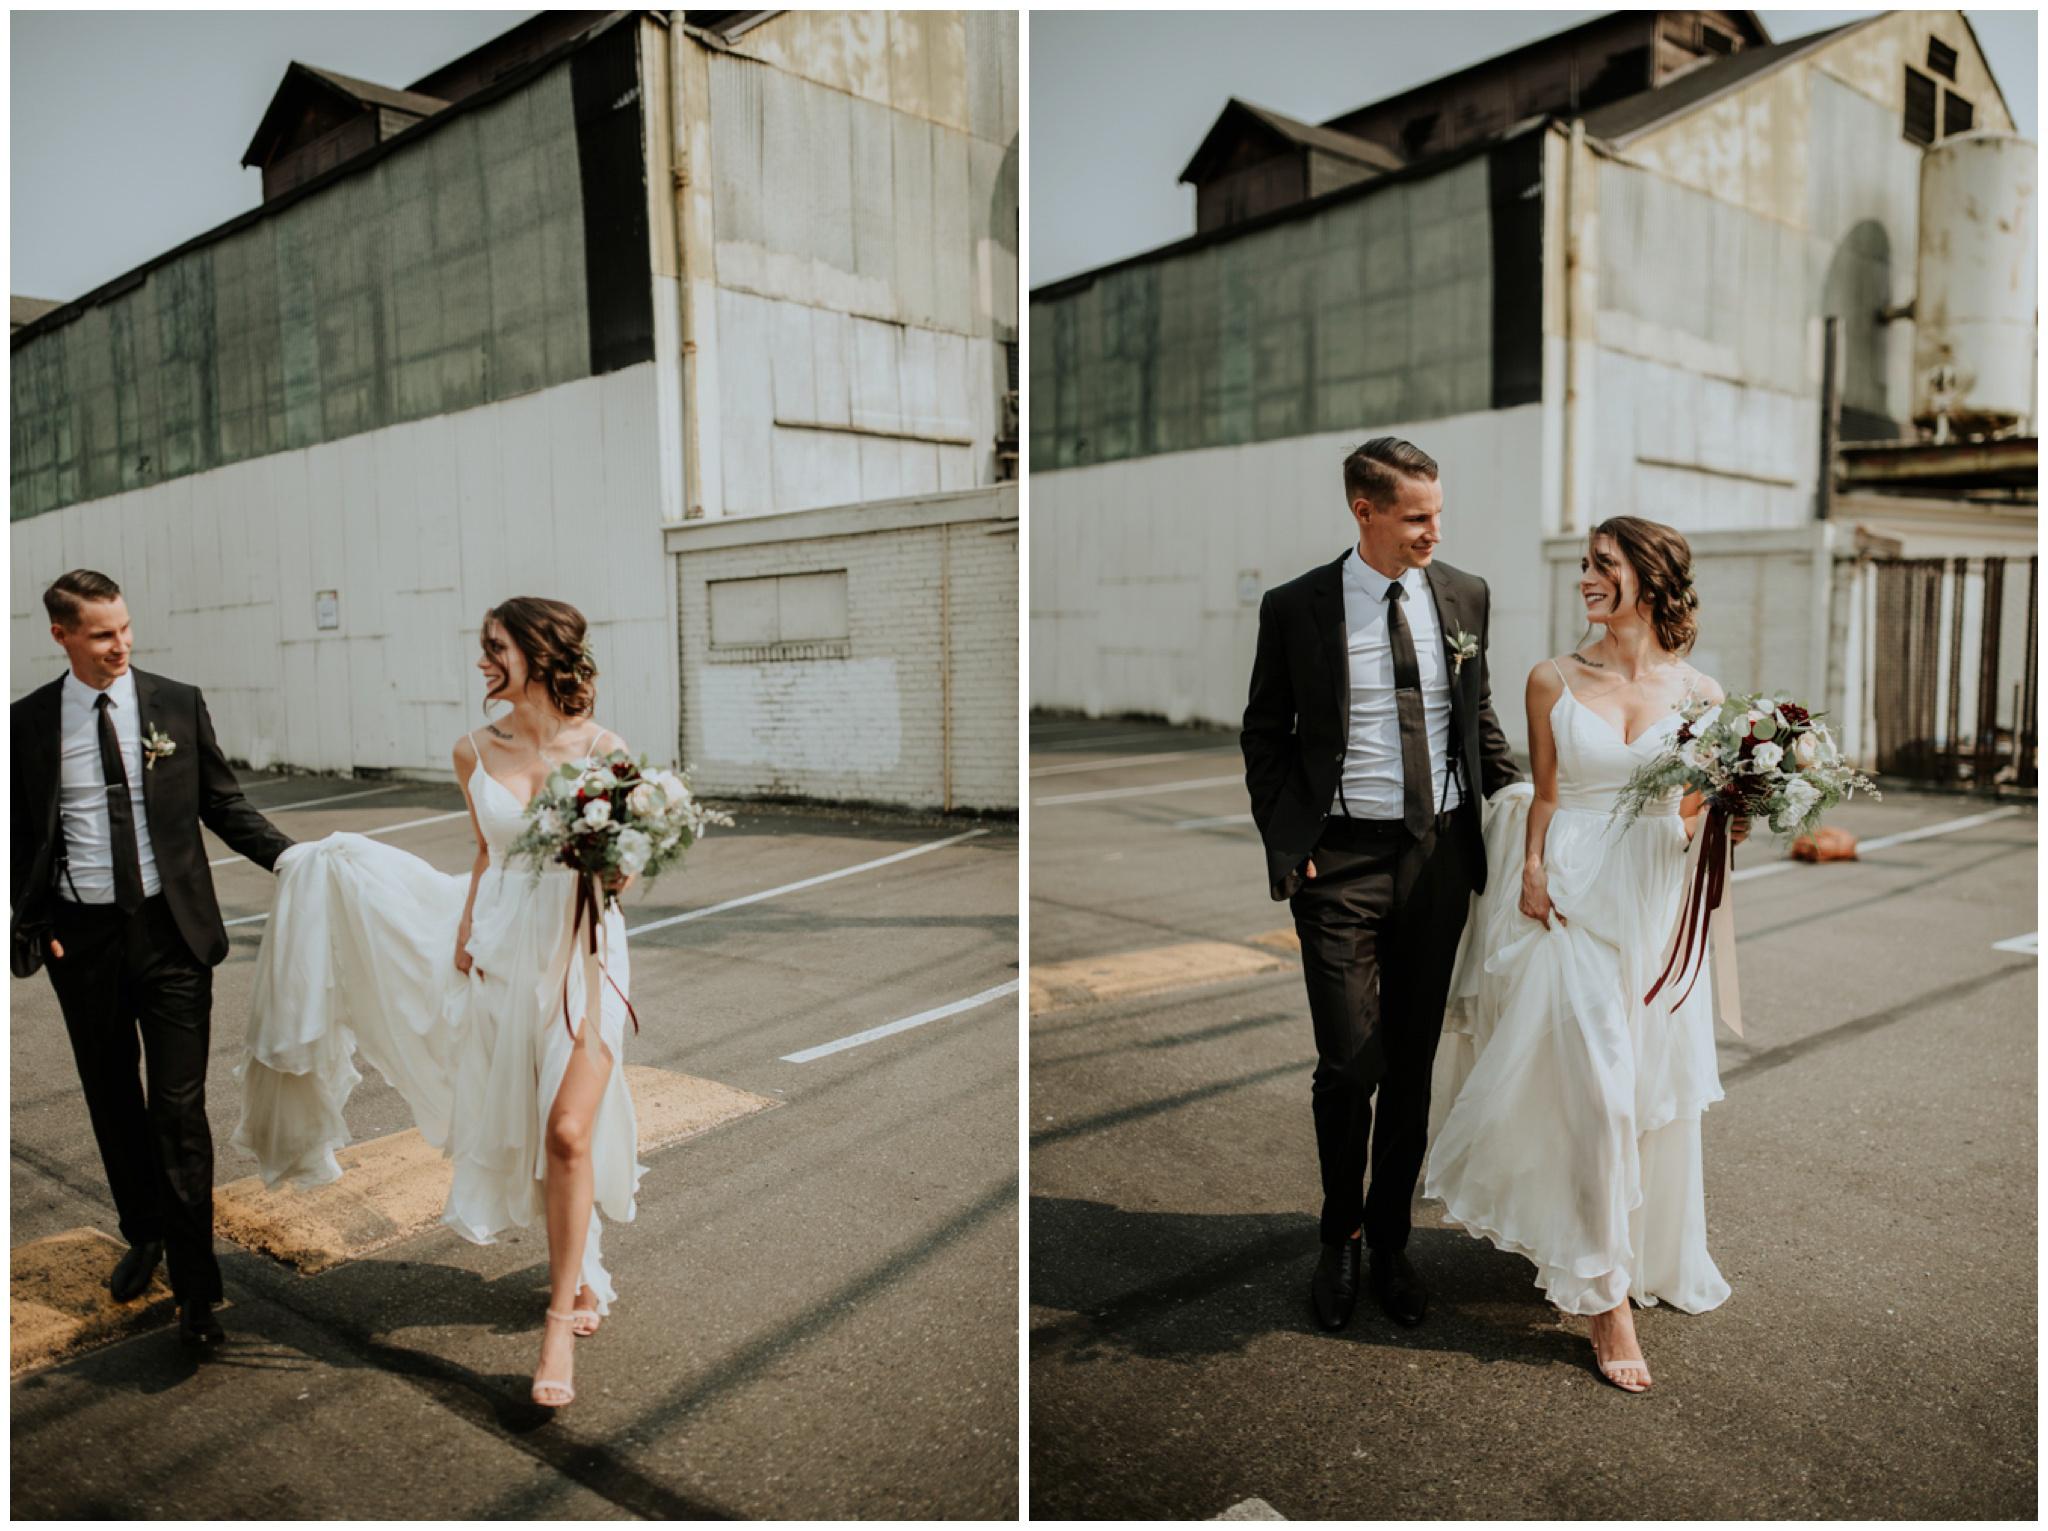 alyssa-keiran-westland-distillery-urban-seattle-wedding-photographer-caitlyn-nikula-78.jpg